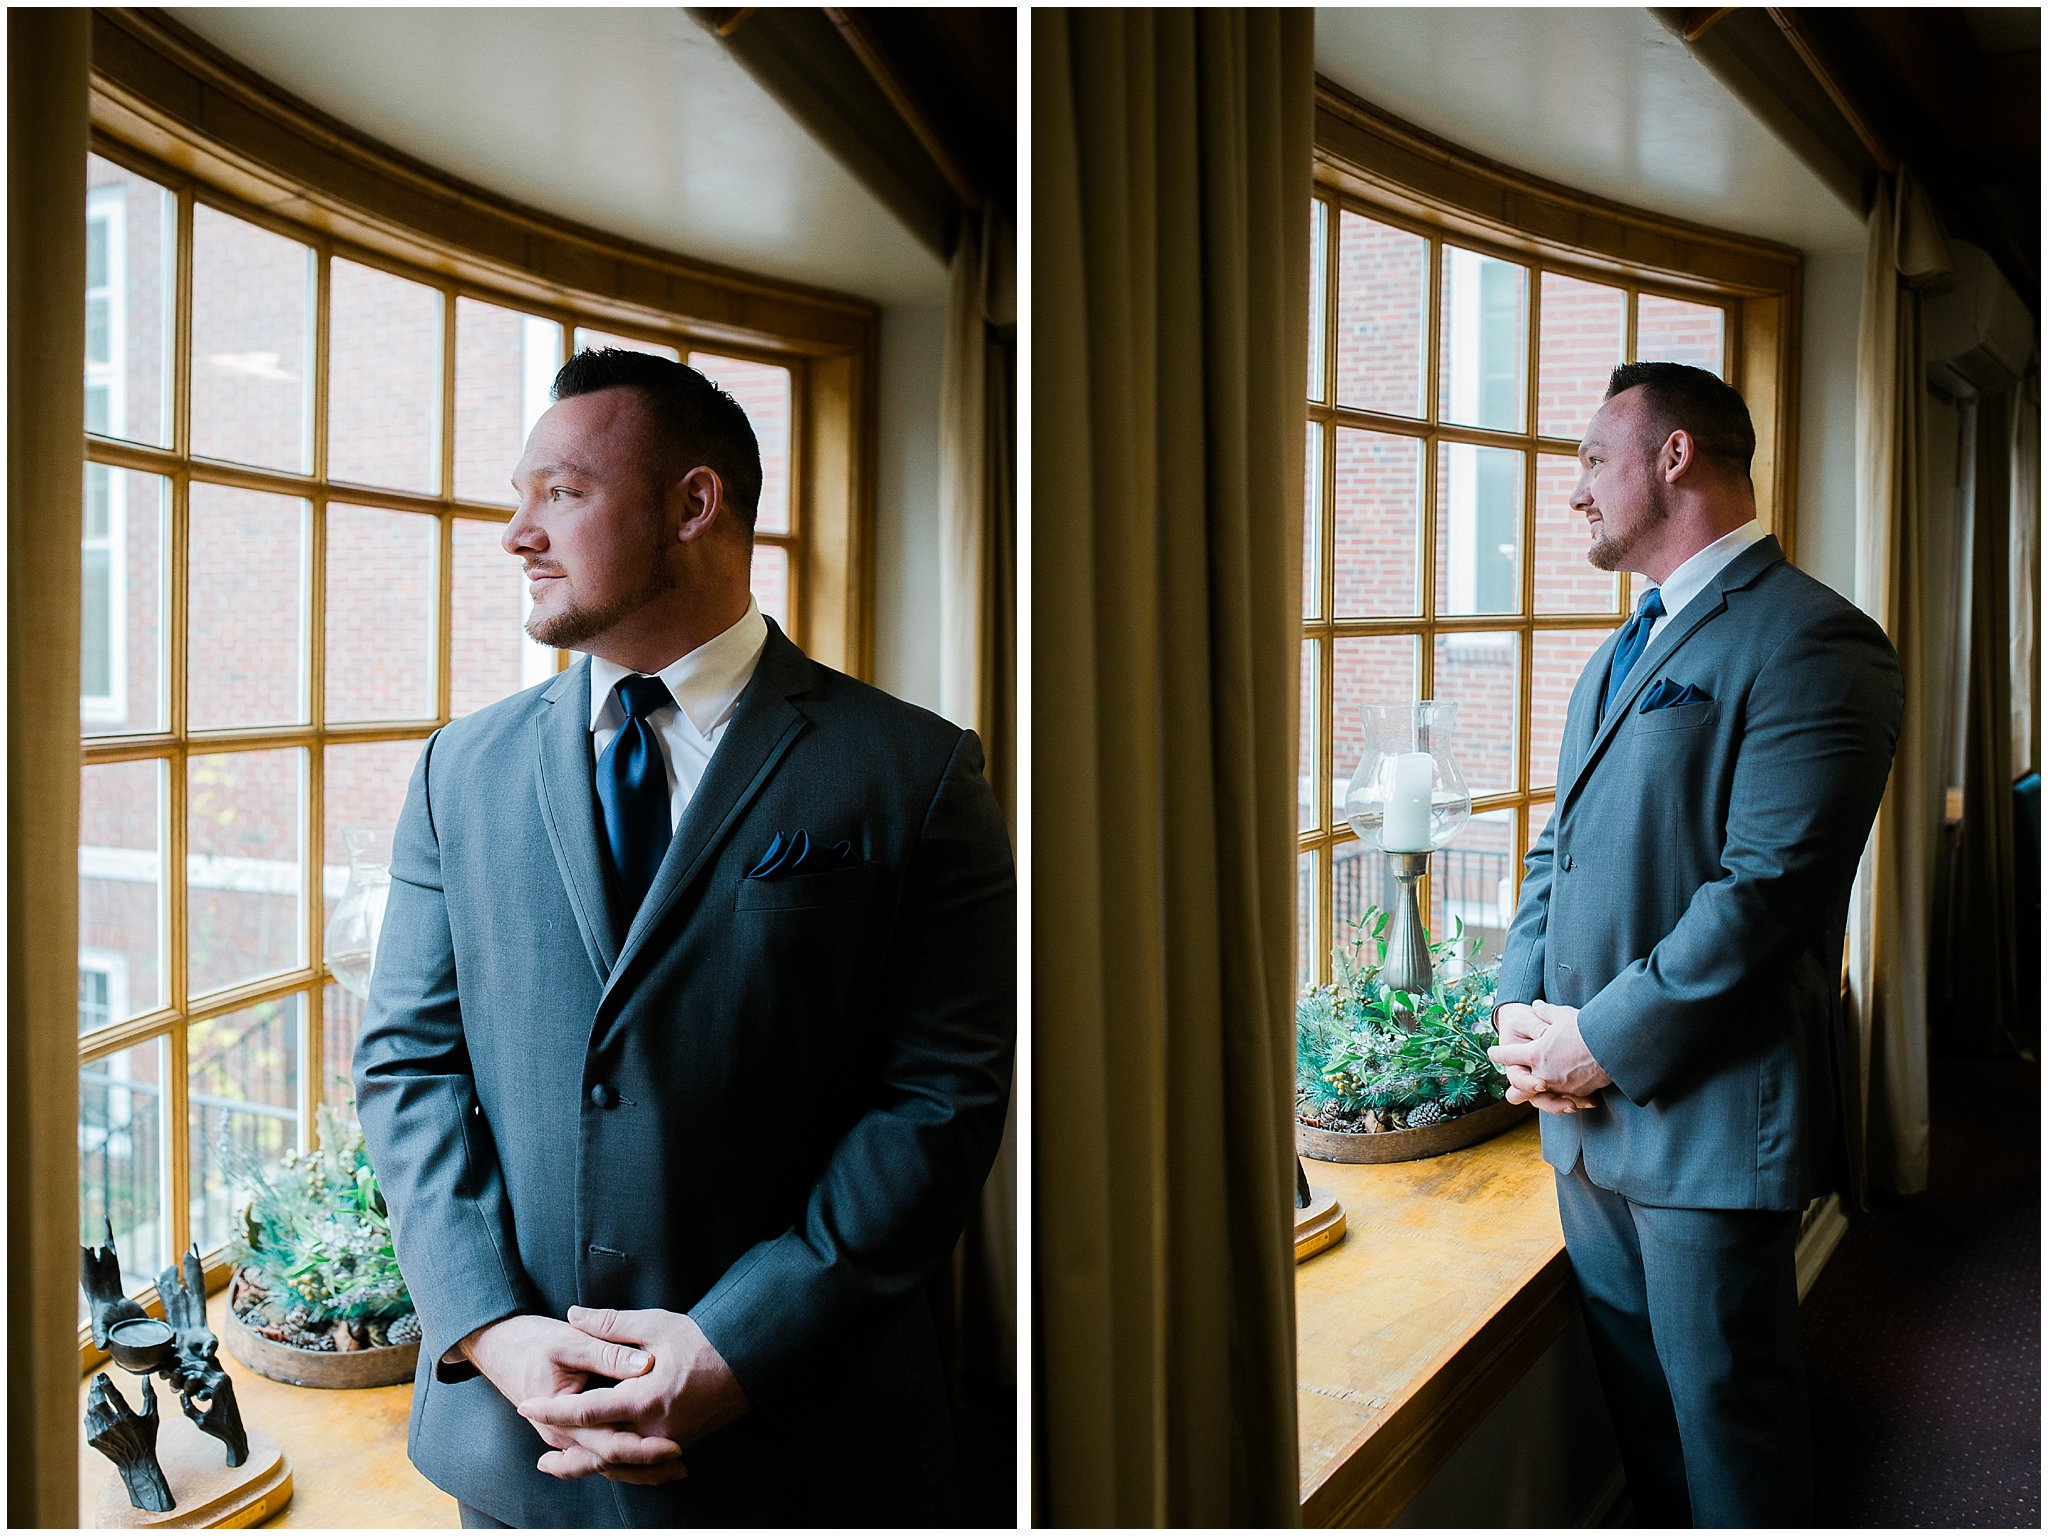 Wollaston Church of the Nazarene Wedding Boston Wedding Photographer4.jpg